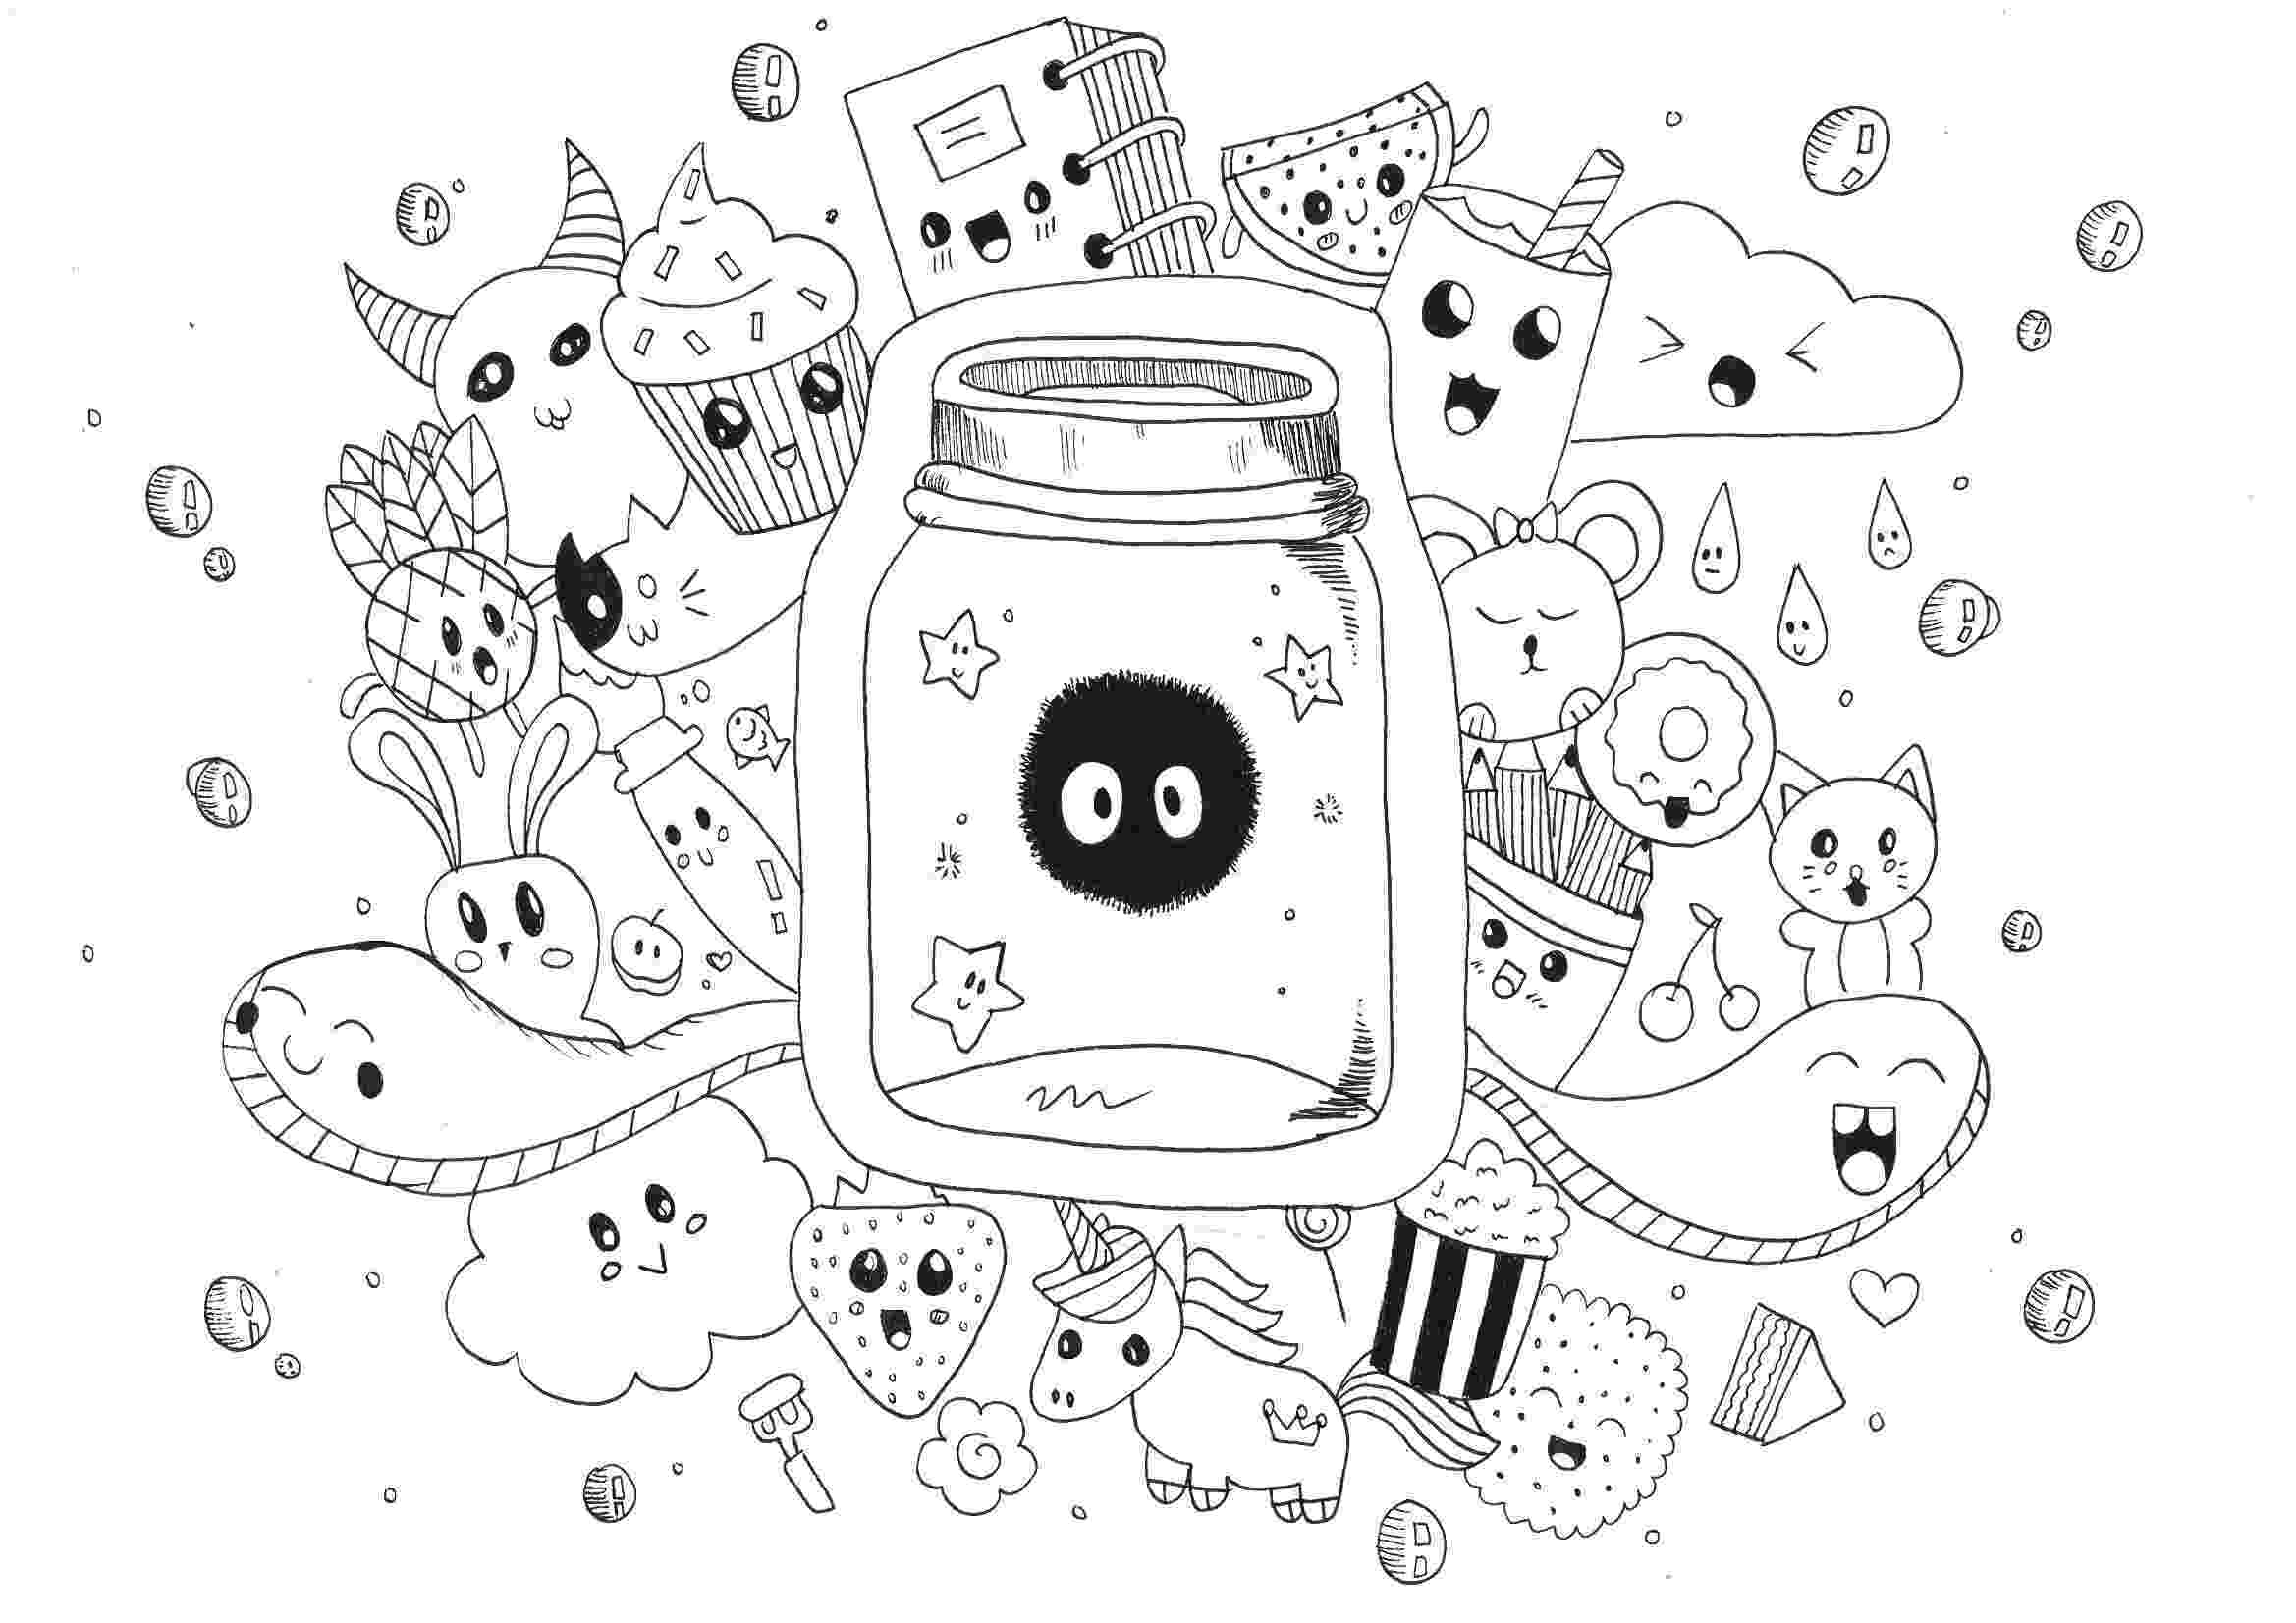 kawaii colouring pages kawaii food doodle free printable coloring page colouring kawaii pages